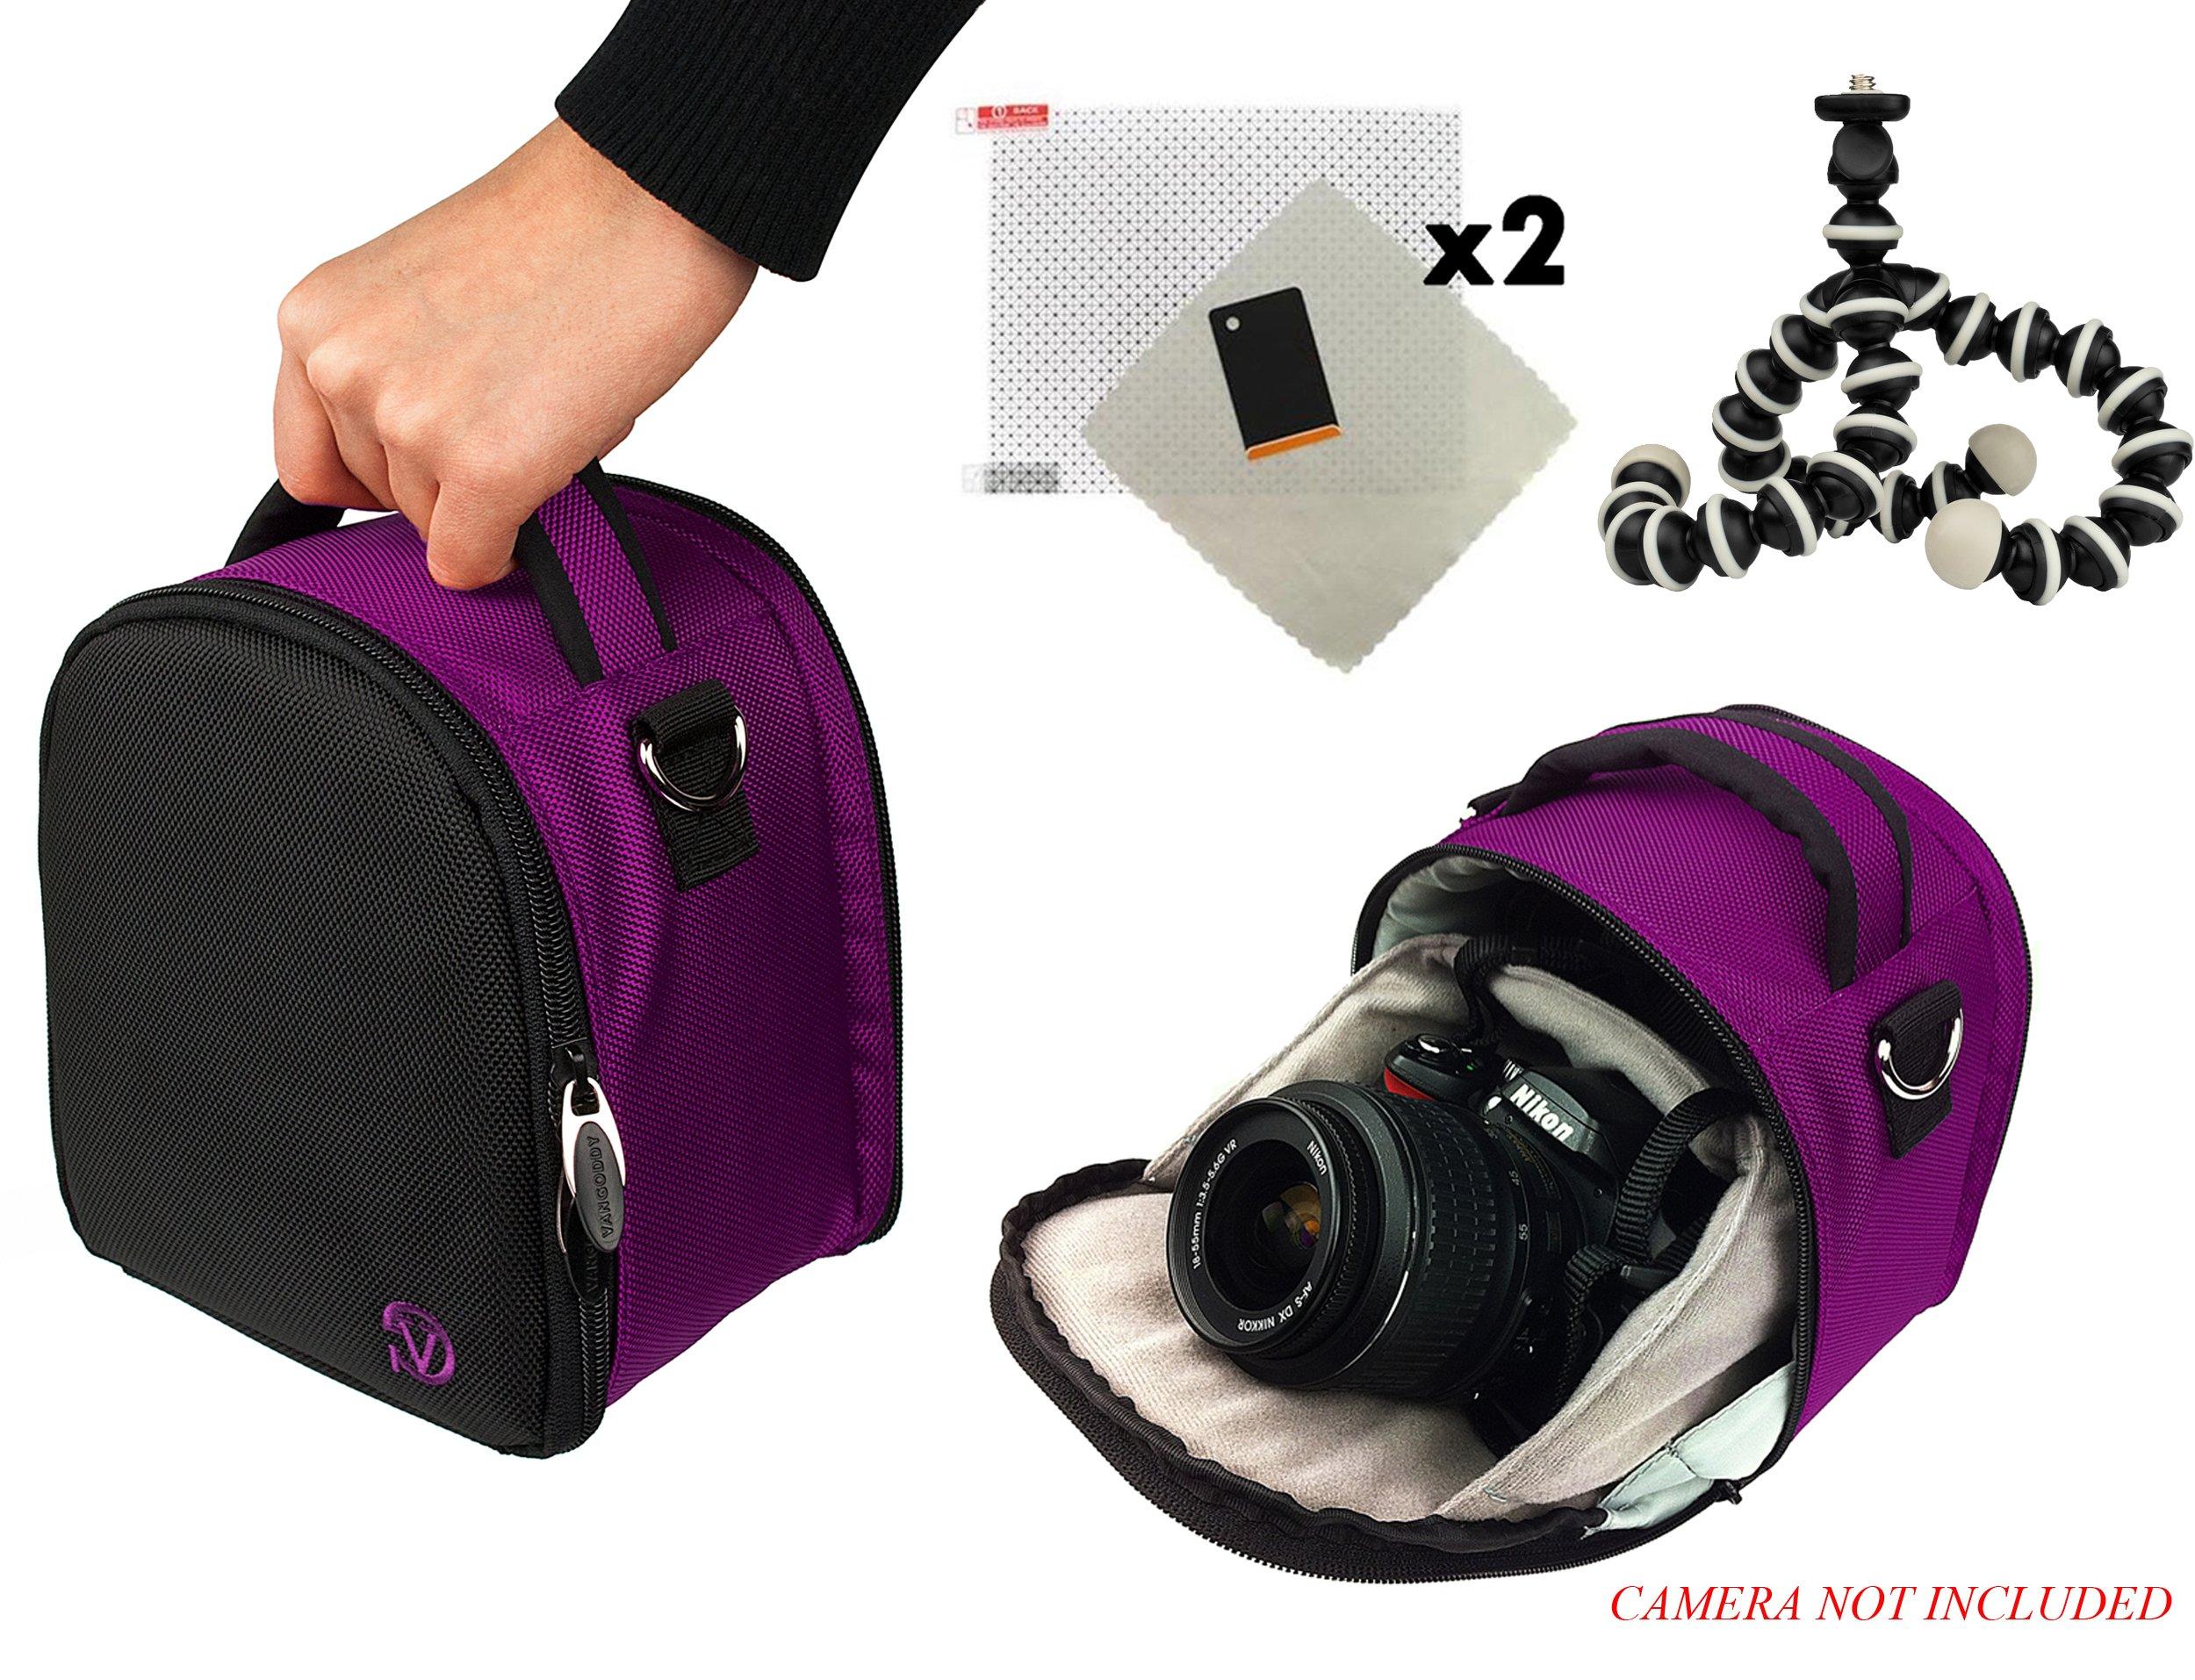 Laurel Travel Camera Bag Case for Nikon D Series D3, D300, D3000, D300s, D3100, D3200, D3300, D3s, D3X DSLR Camera and Screen Protector and Screen Protector and Mini Tripod by Vangoddy